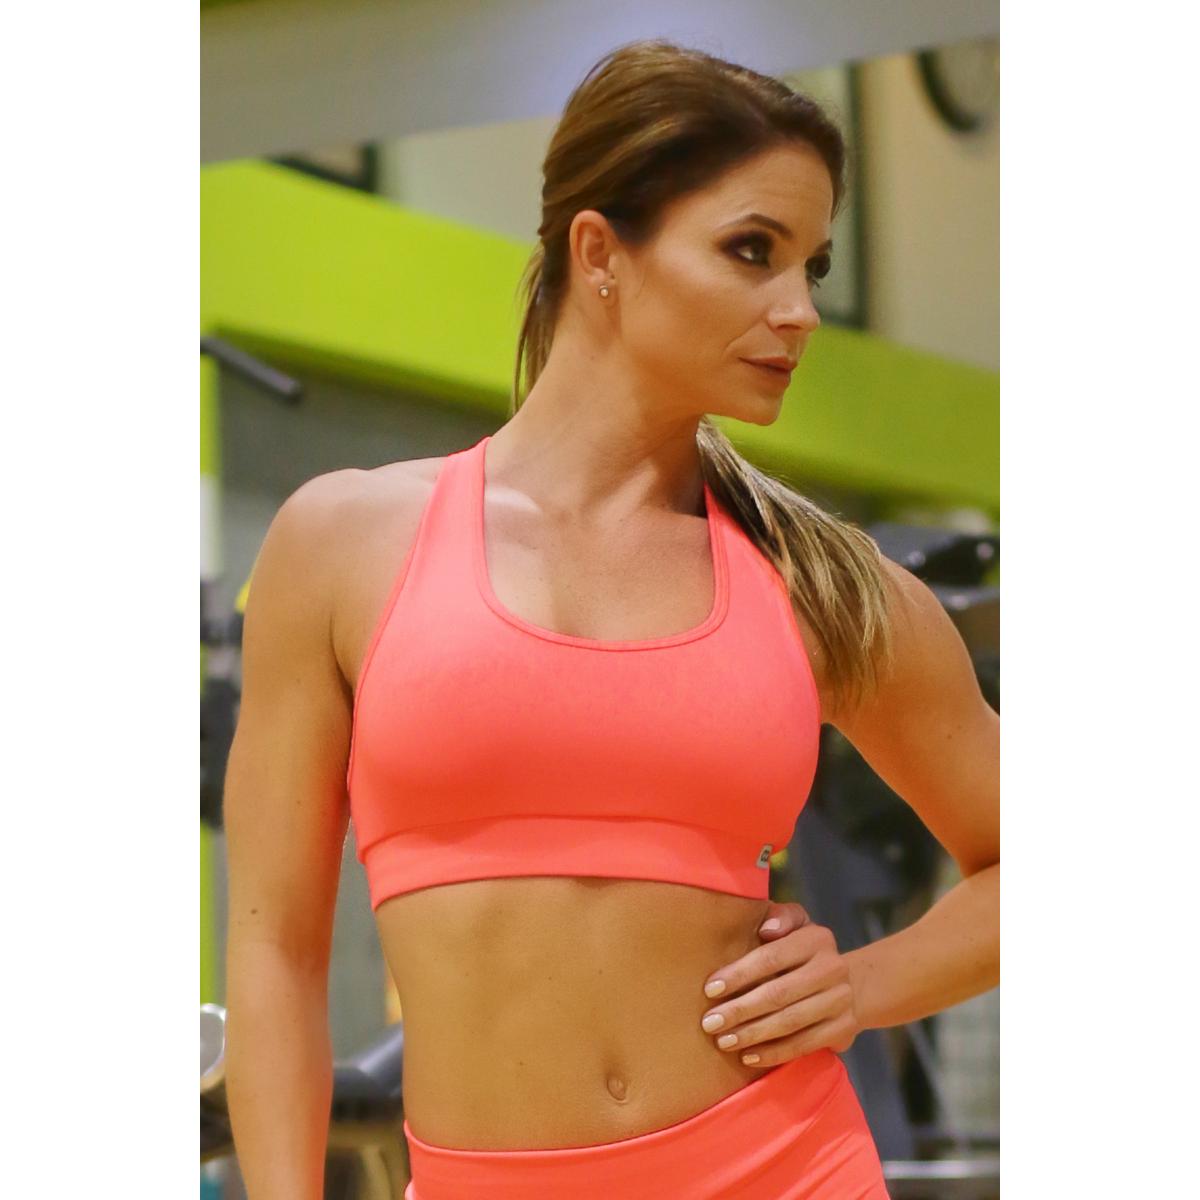 Neon korall (rio) basic női fitness sport top